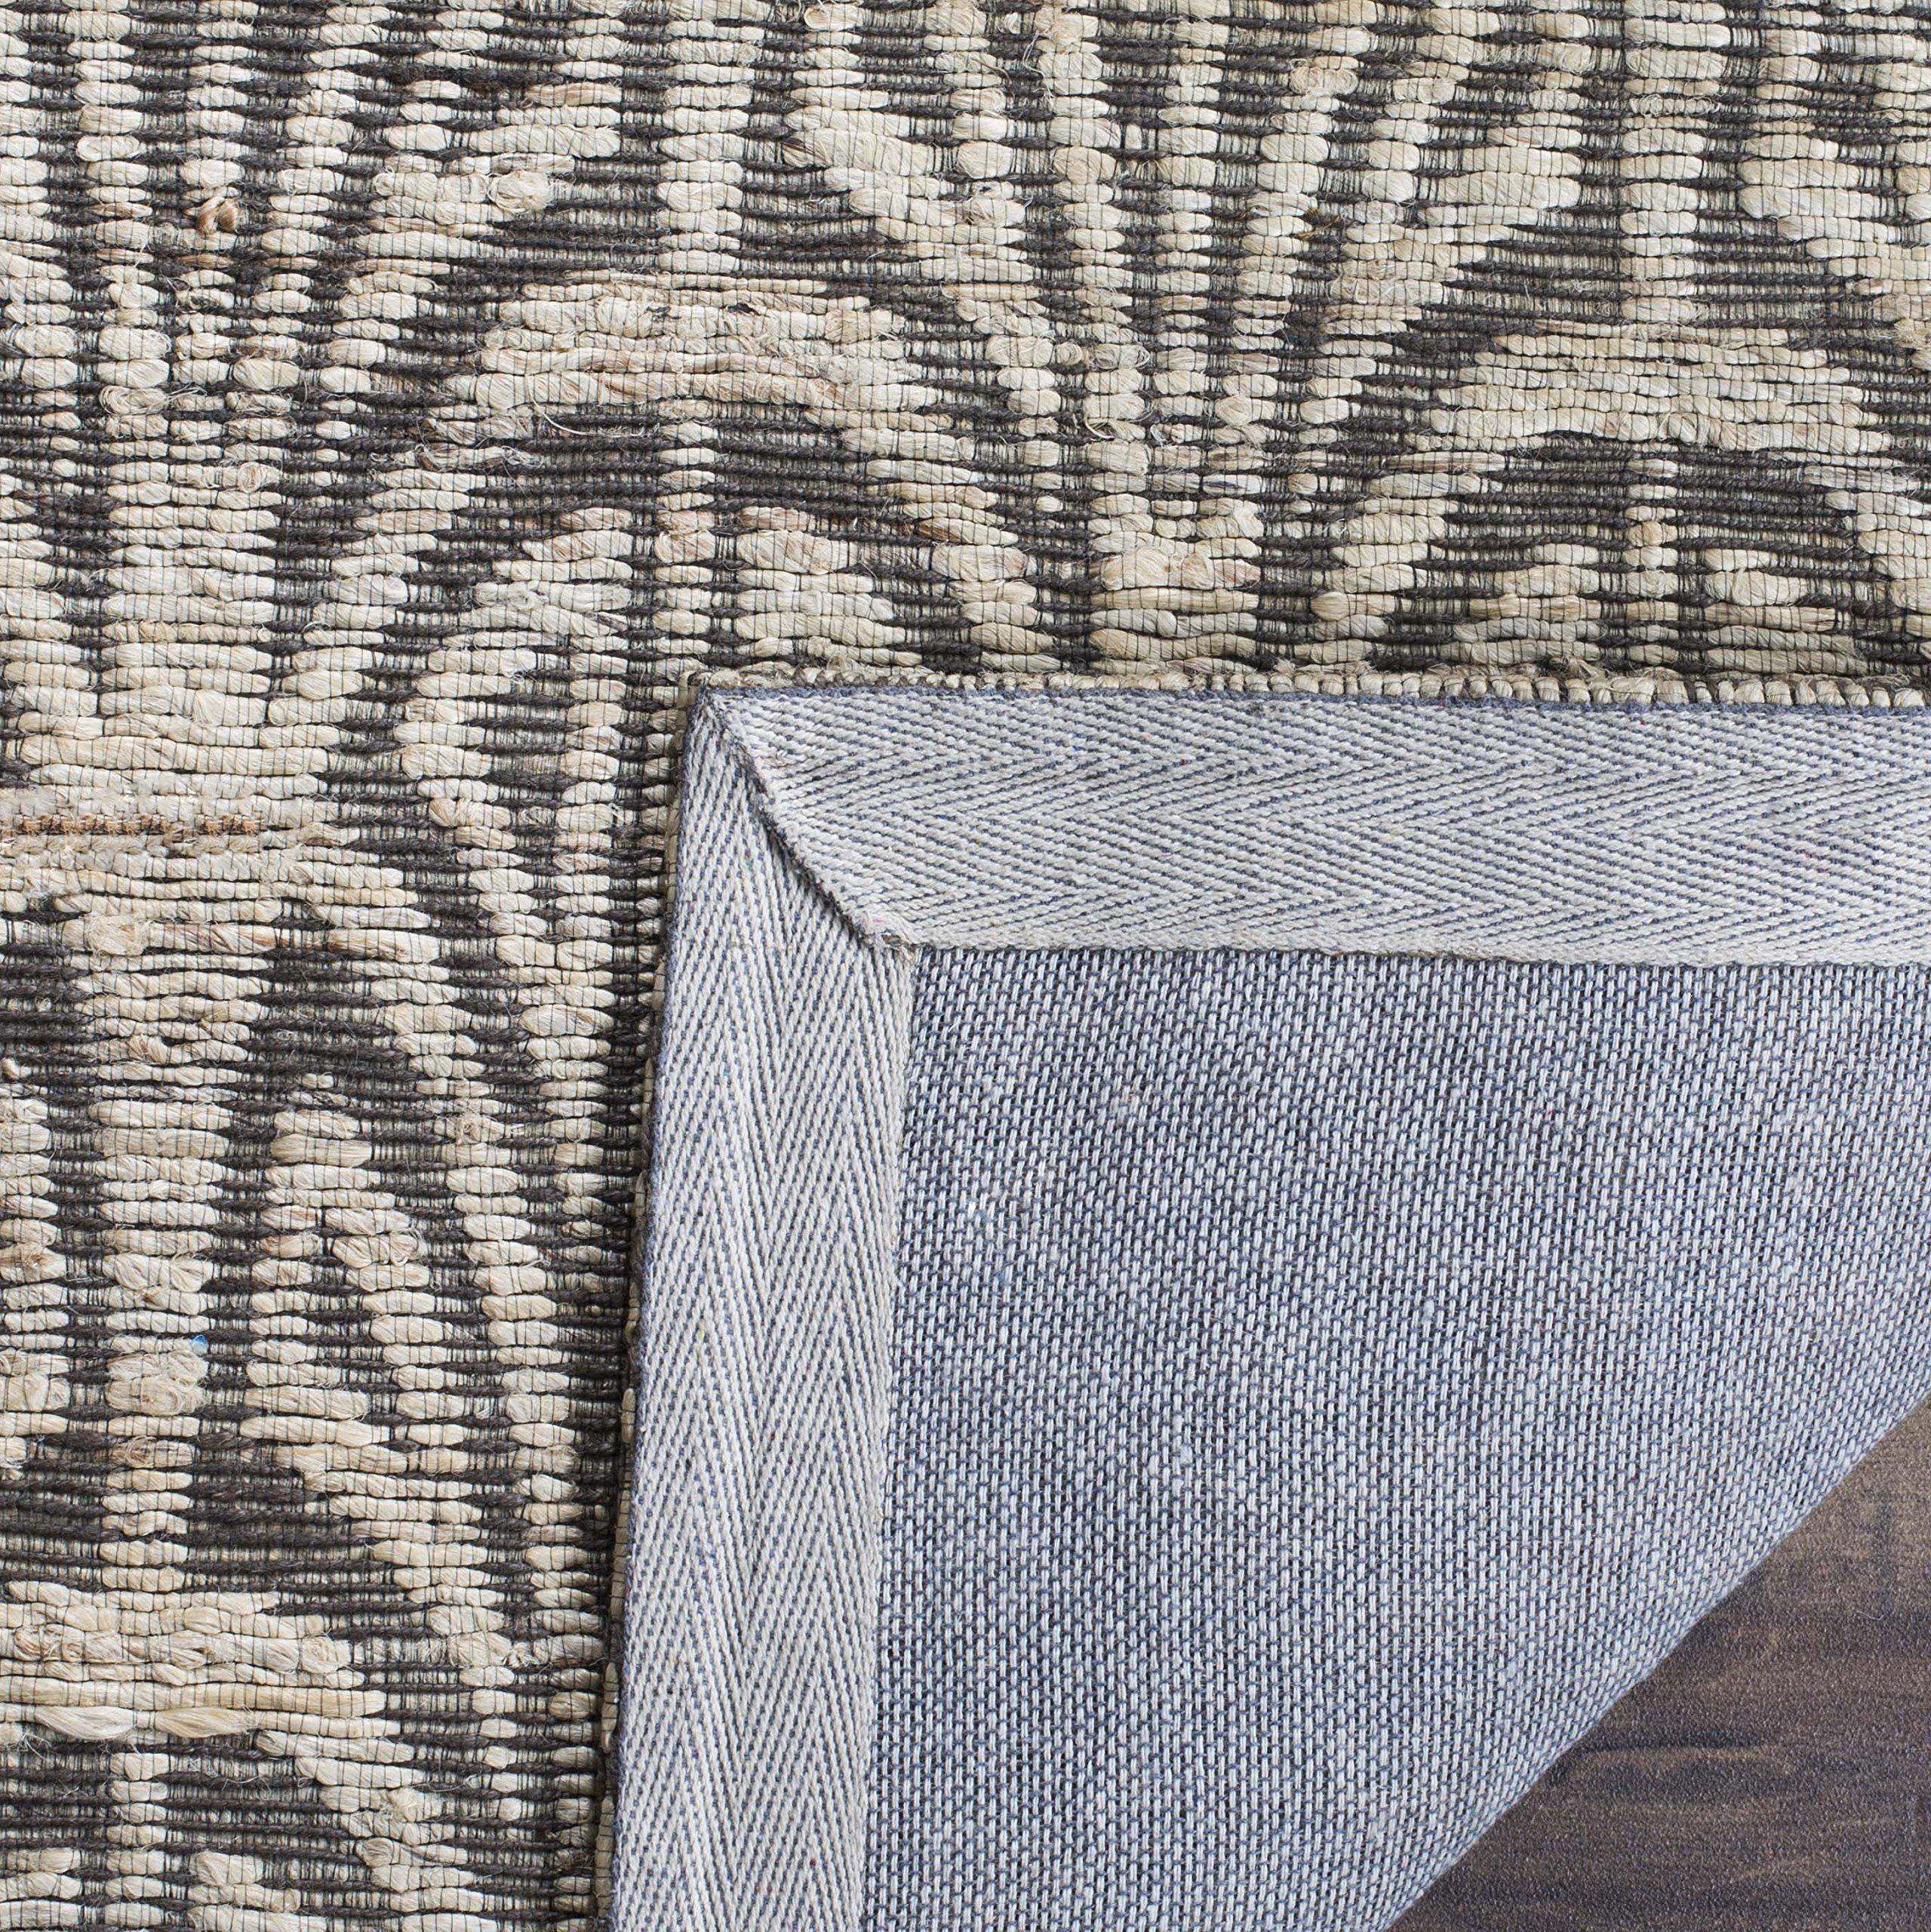 Safavieh CAP501B-5 Cape Cod Collection Flat Weave Handmade Area Rug, 5' x 8', Light Beige/Grey by Safavieh (Image #3)